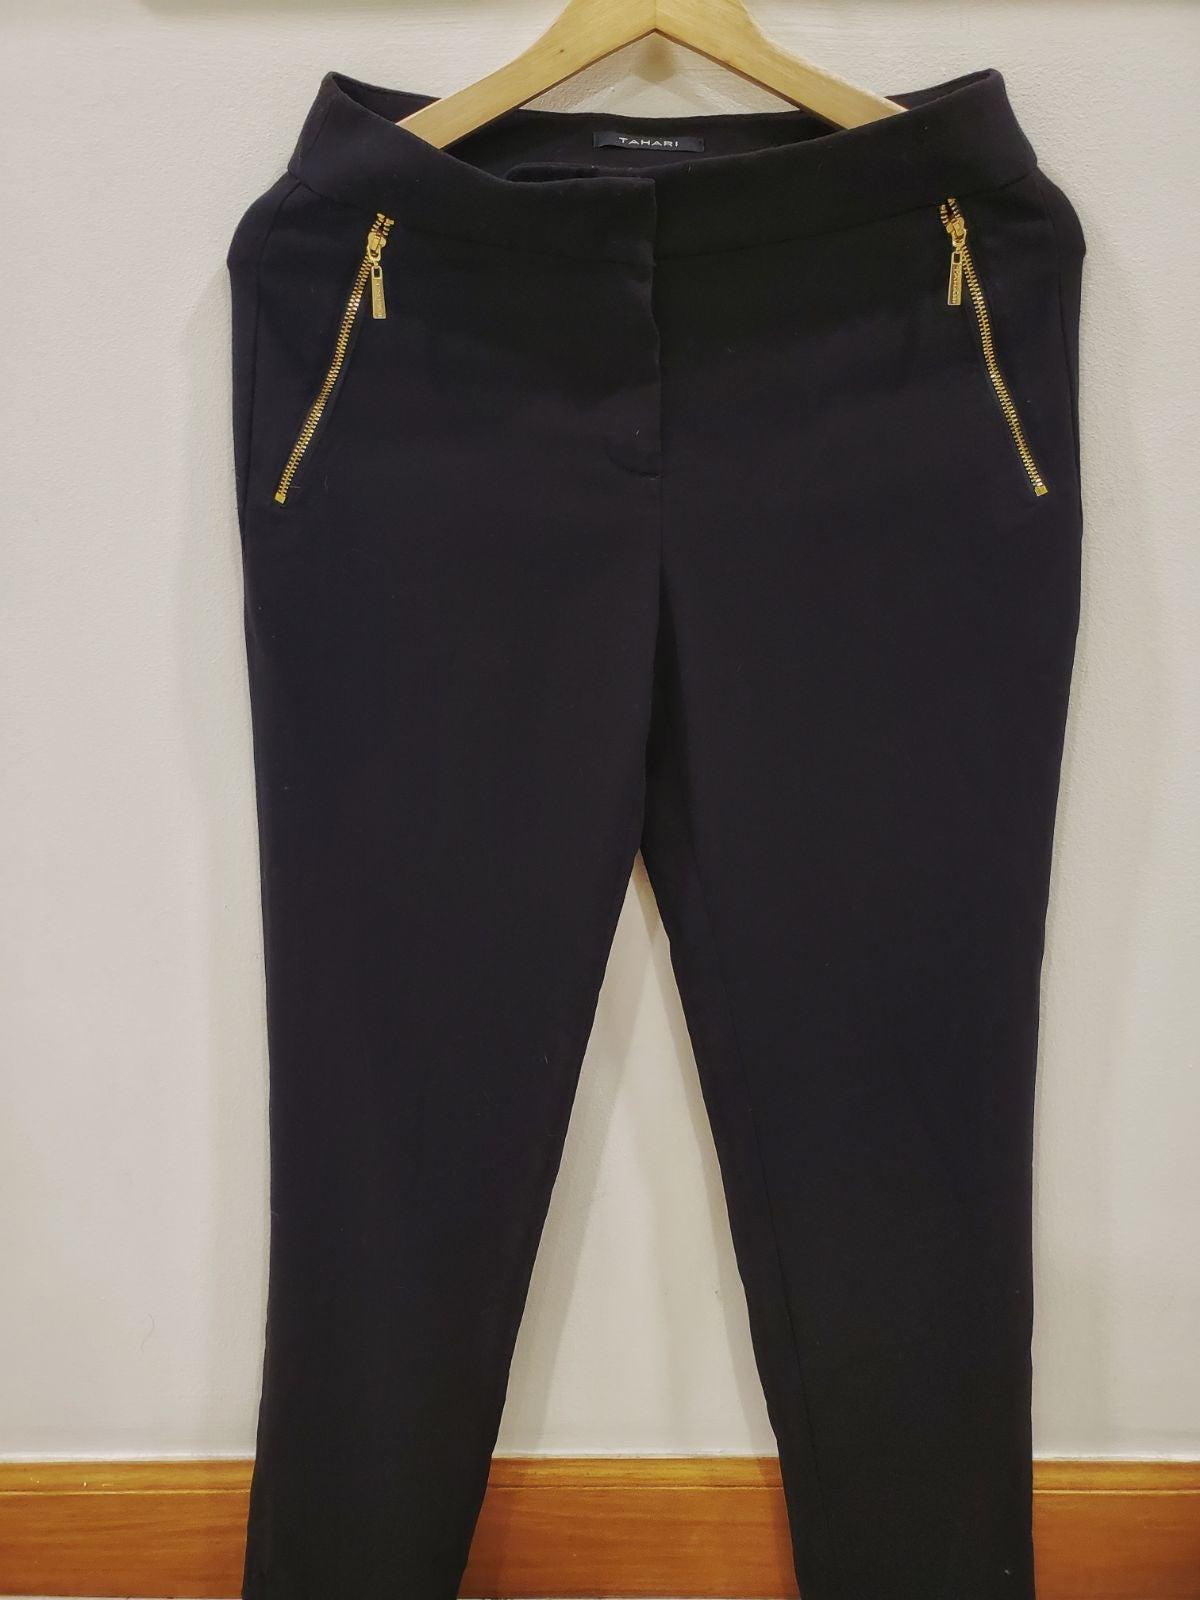 Tahari pants